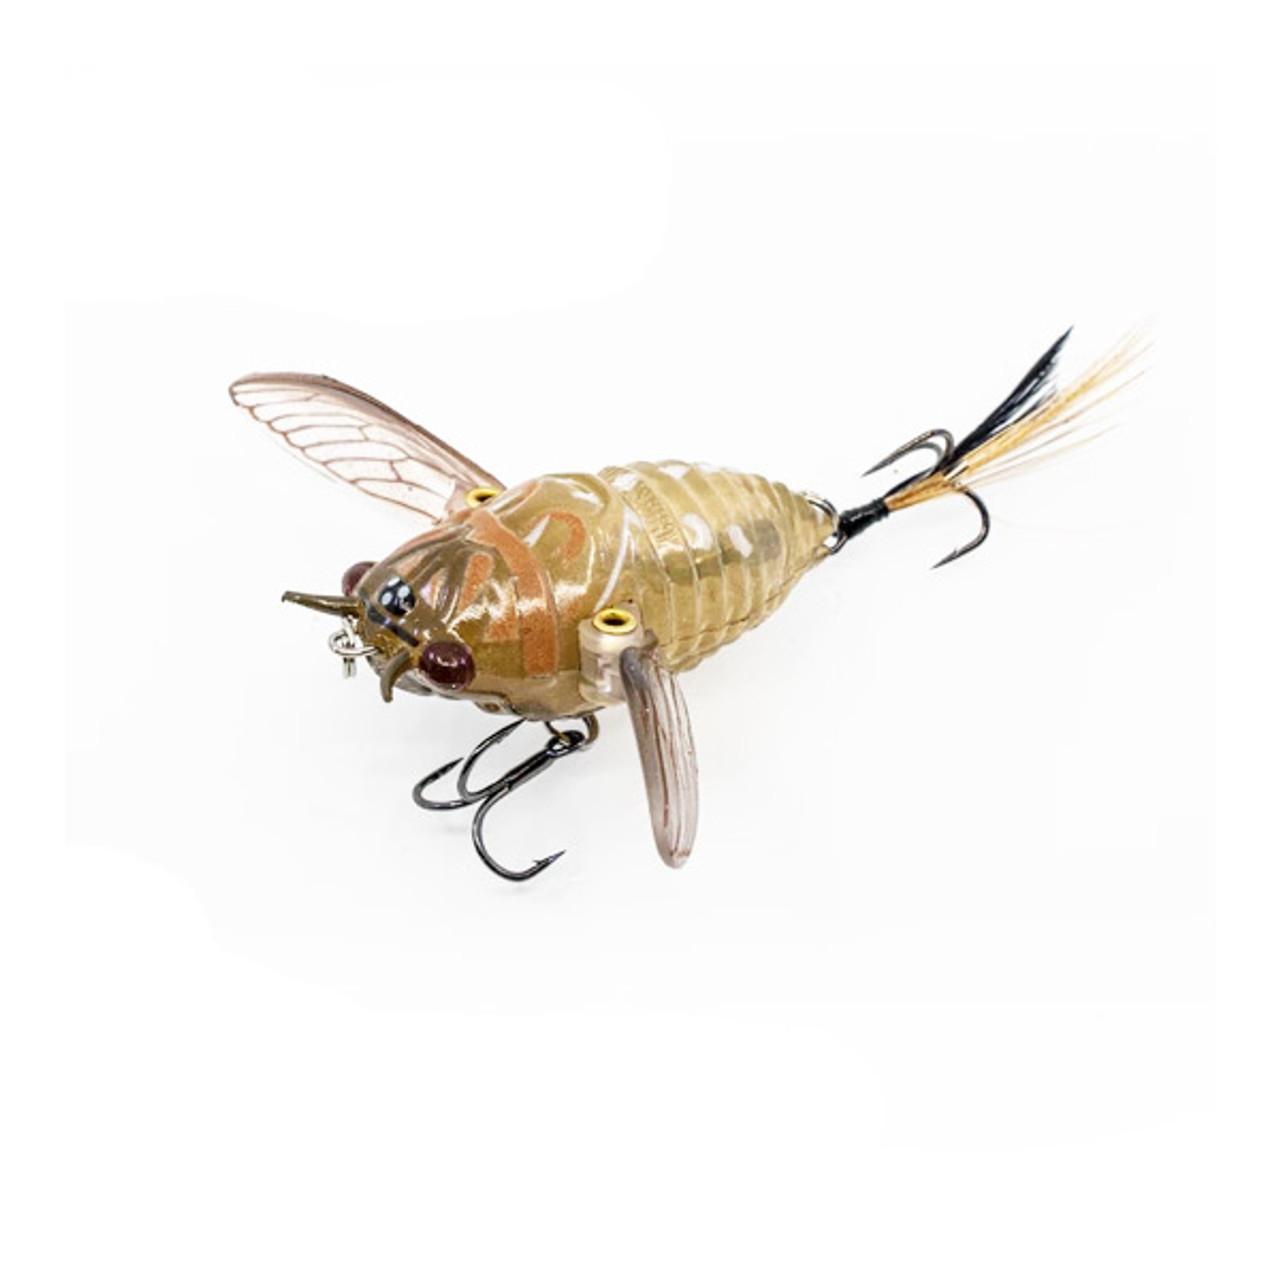 "Ripple Cicada 1.75"" Topwater Bait"